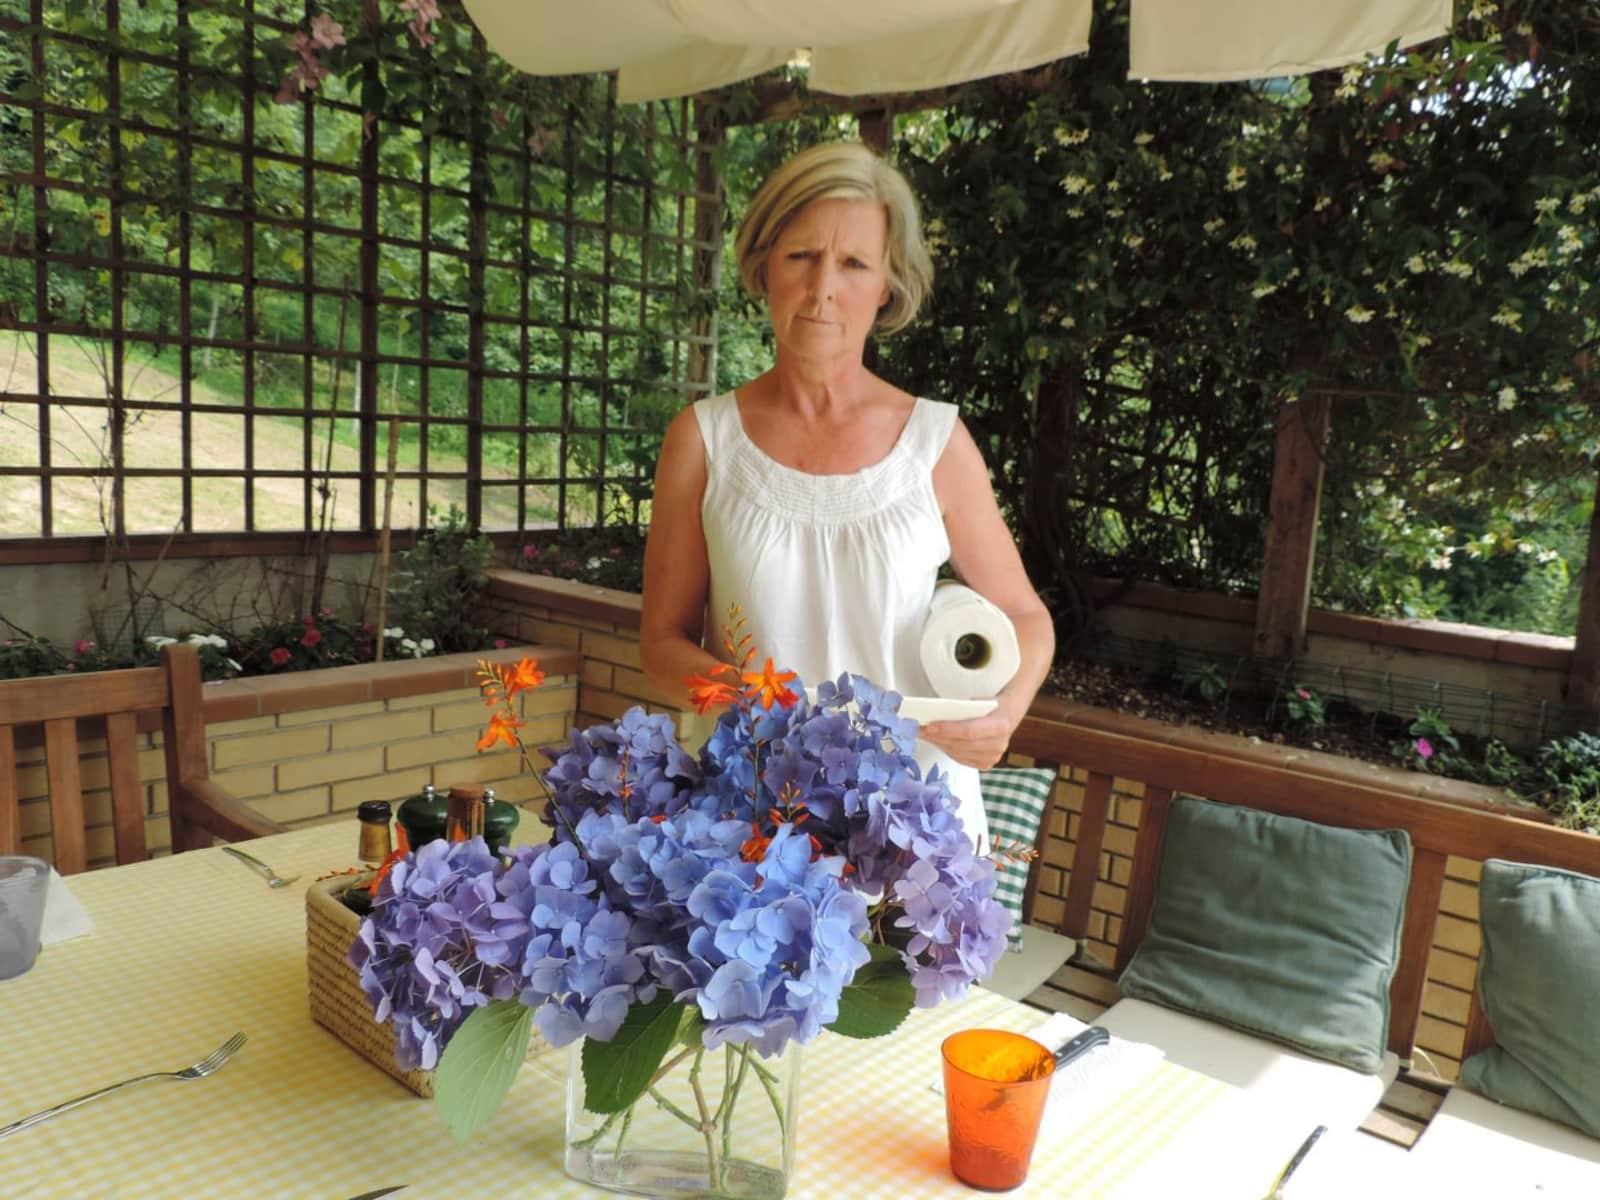 Elizabeth from Pordenone, Italy